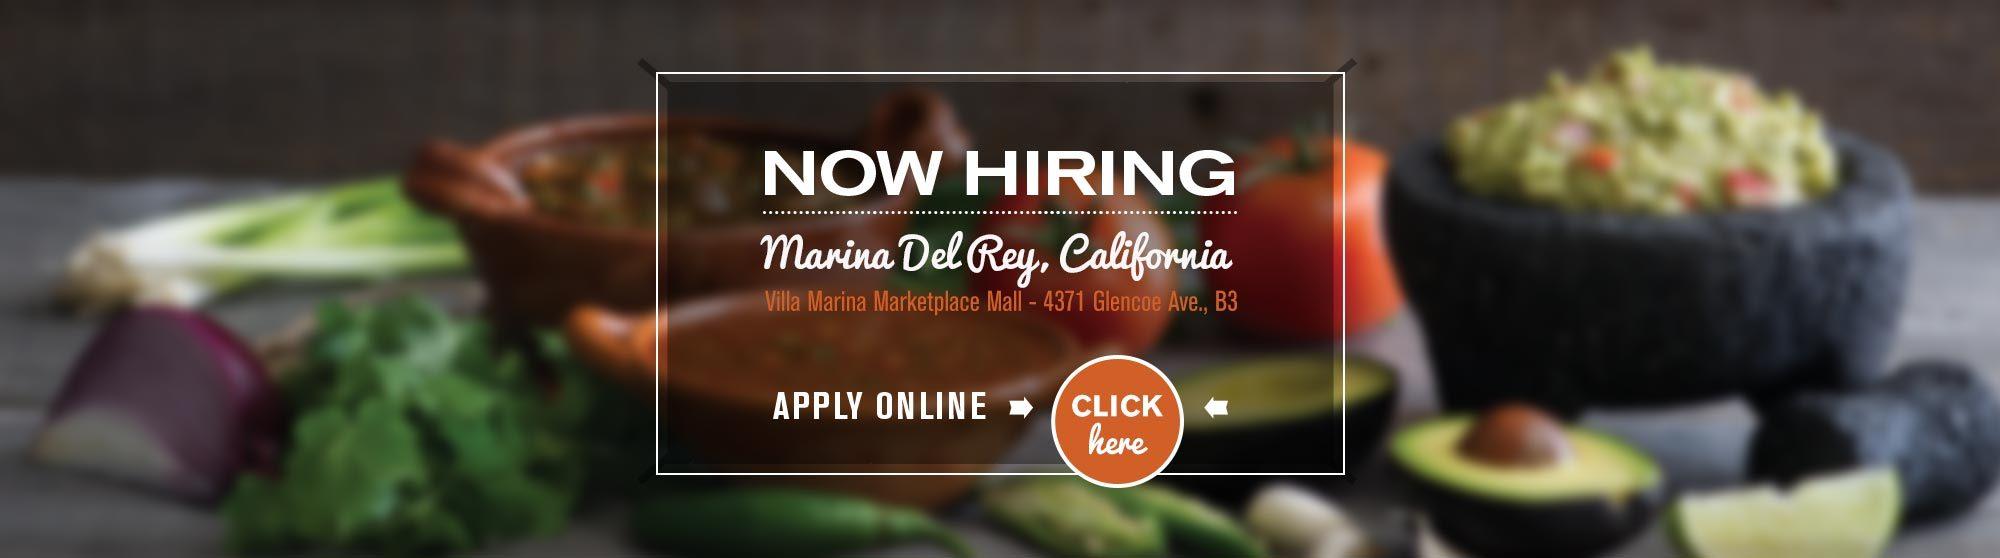 sh-homepage-marina-del-rey-now-hiring